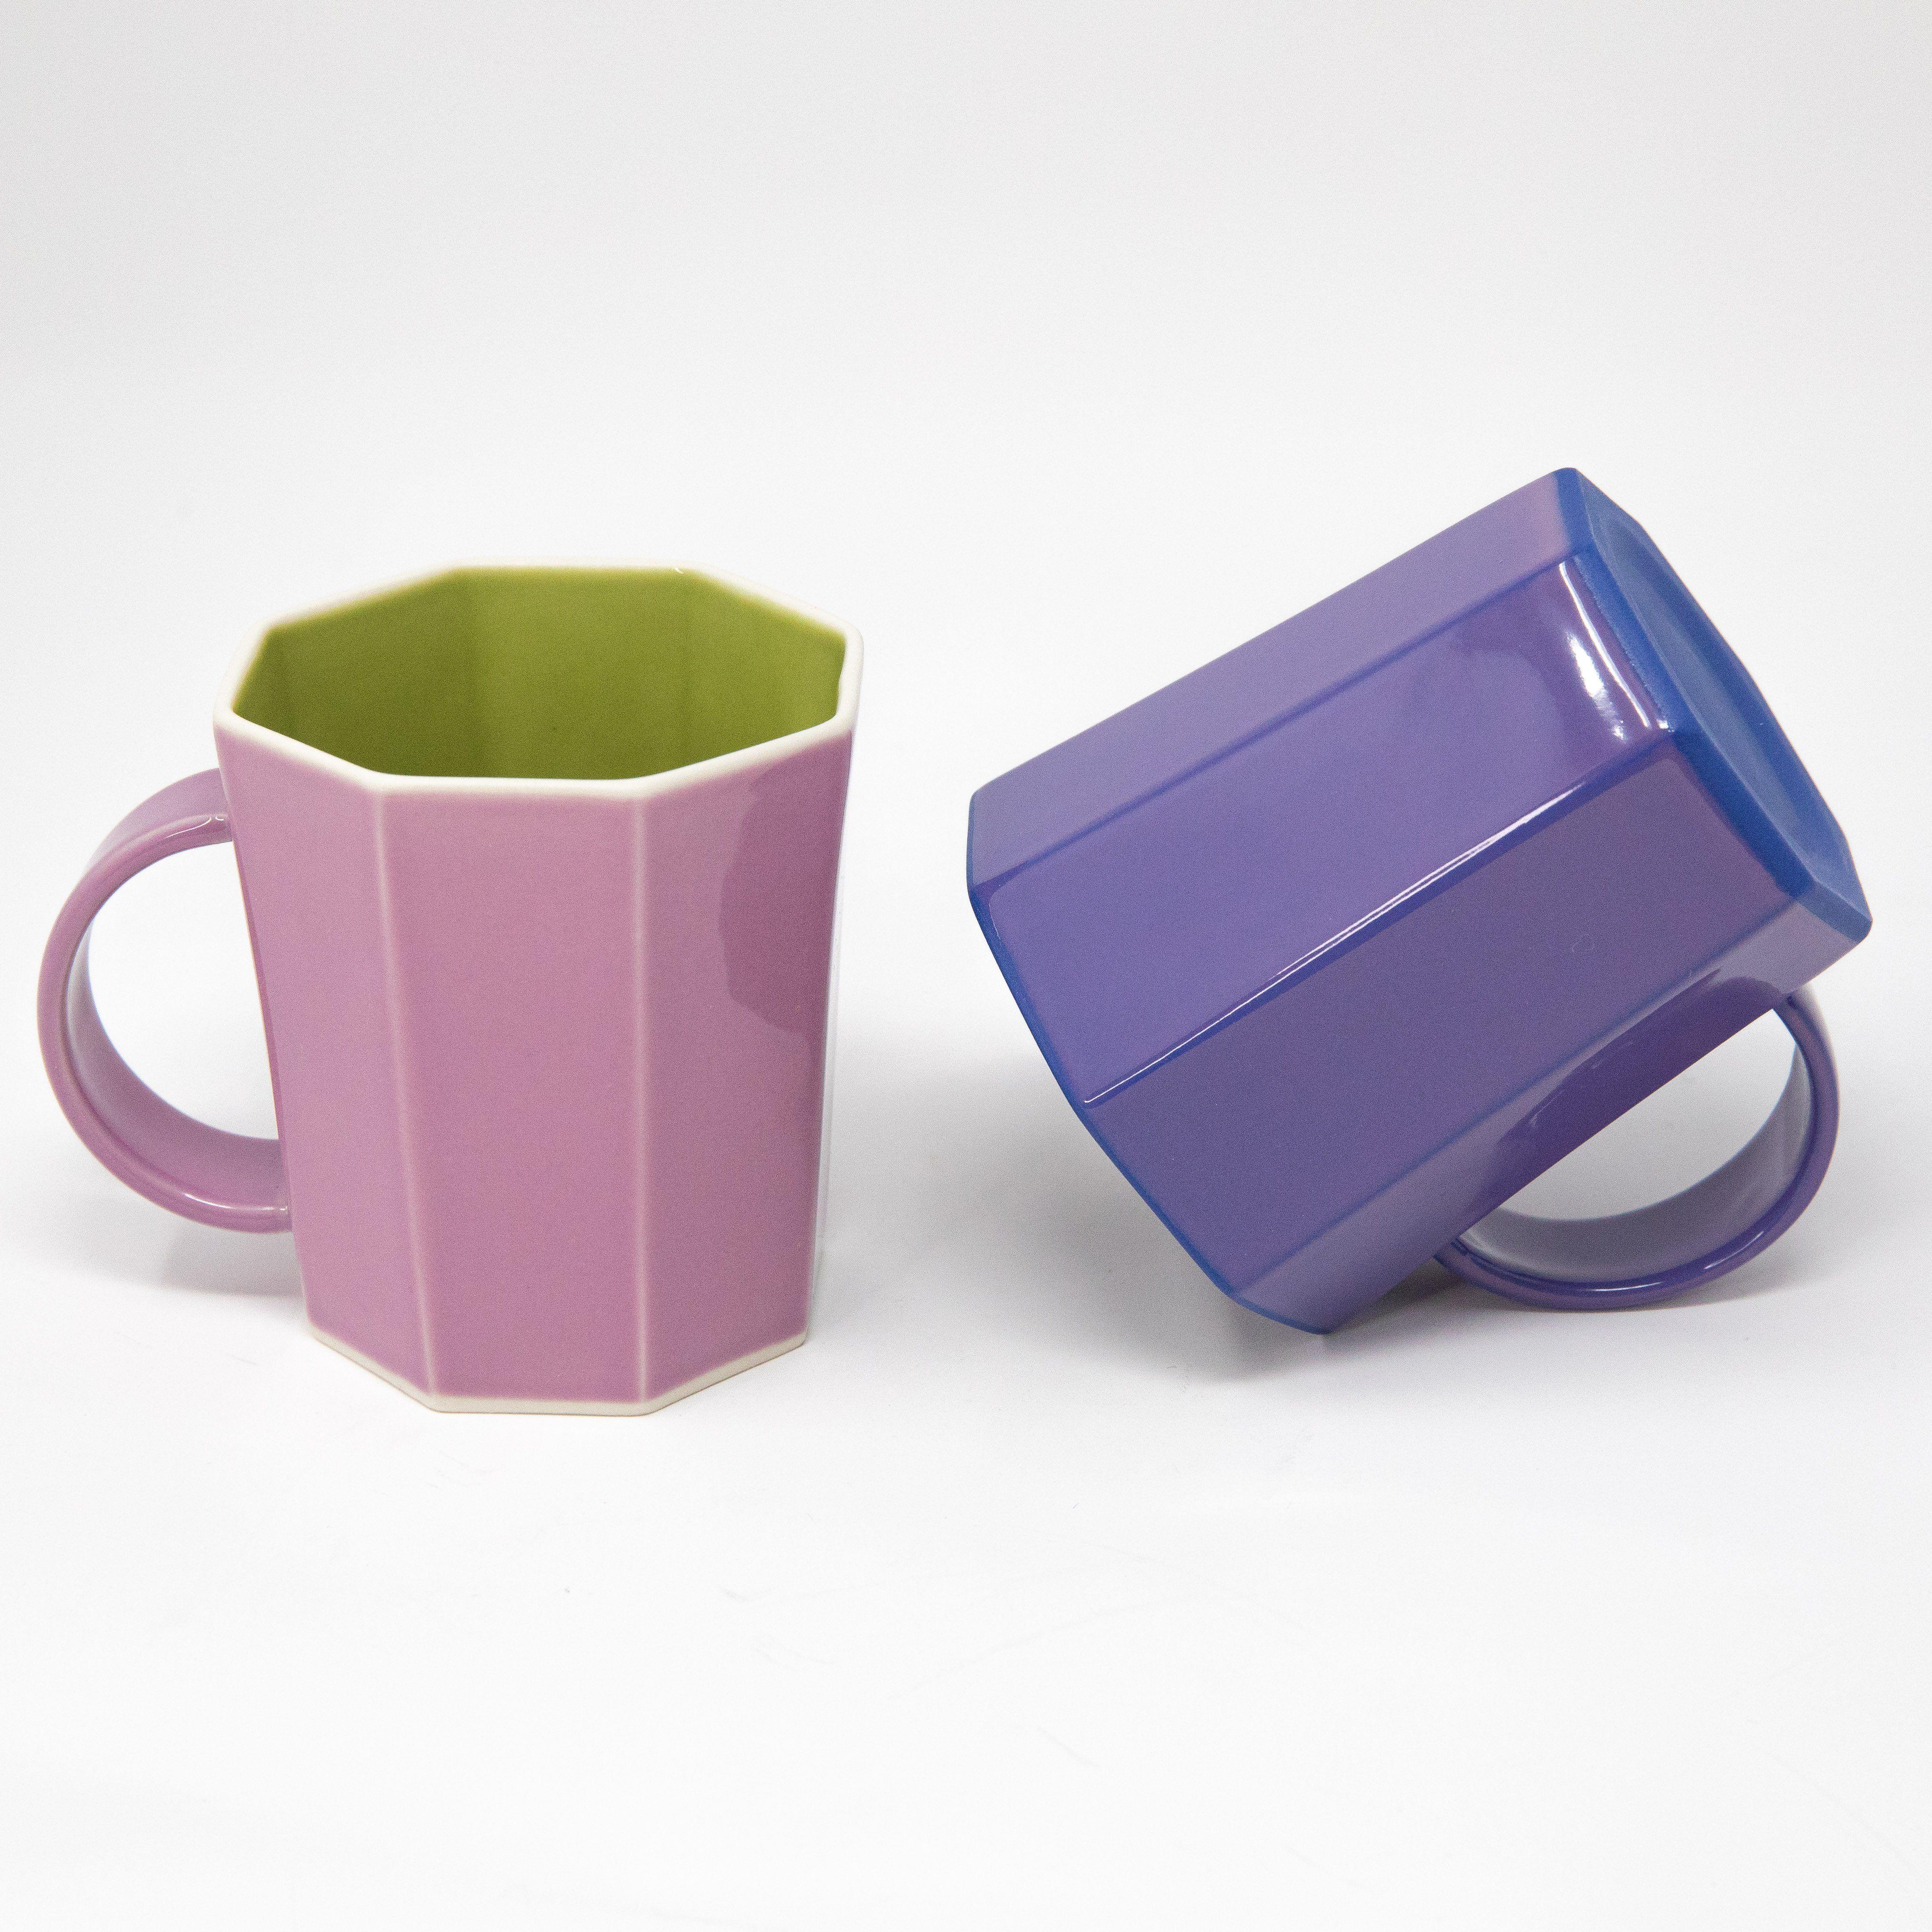 Yume Mug - Pastel Violet